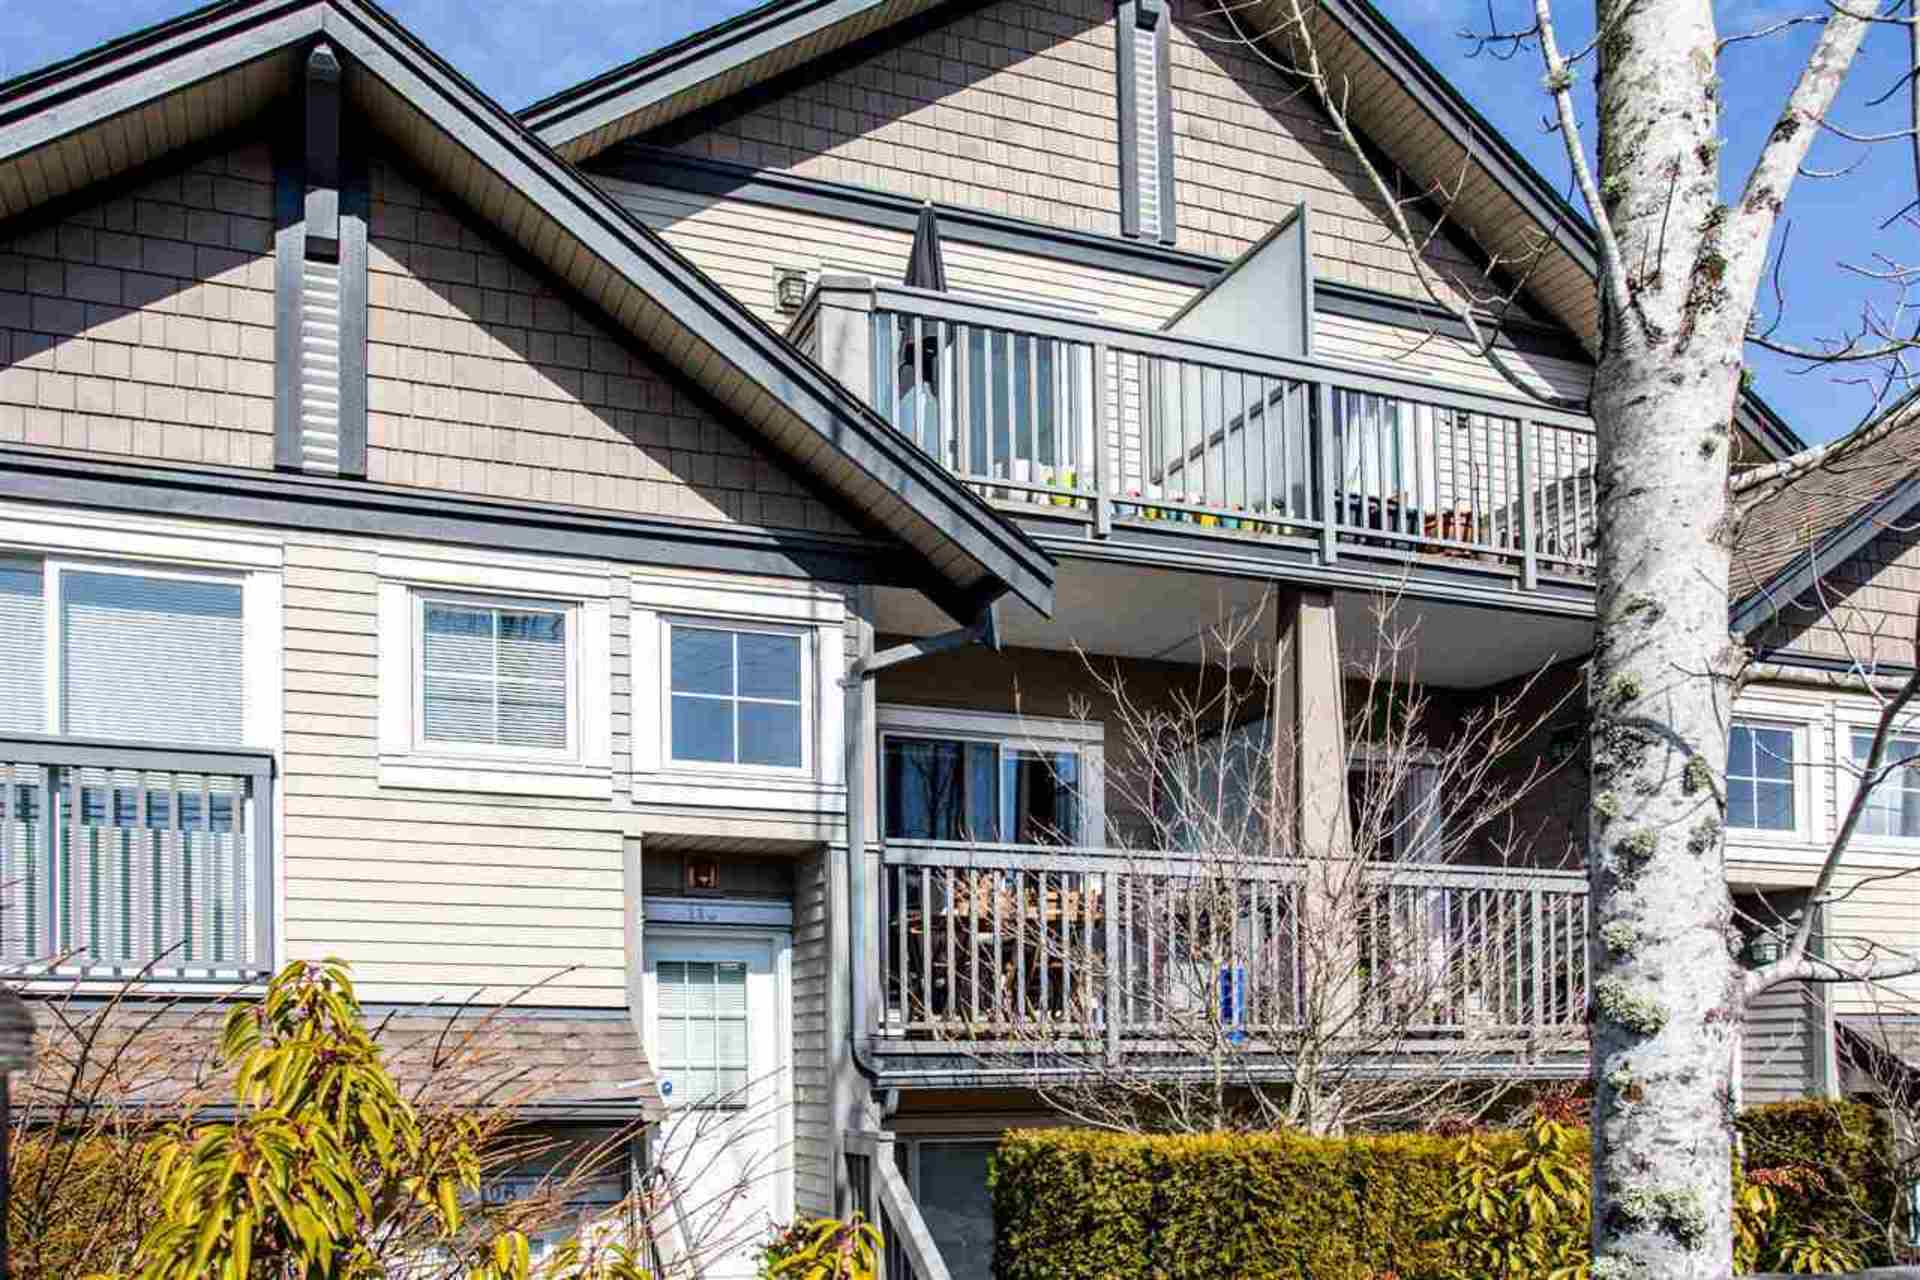 110 - 4438 Albert Street, Vancouver Heights, Burnaby North